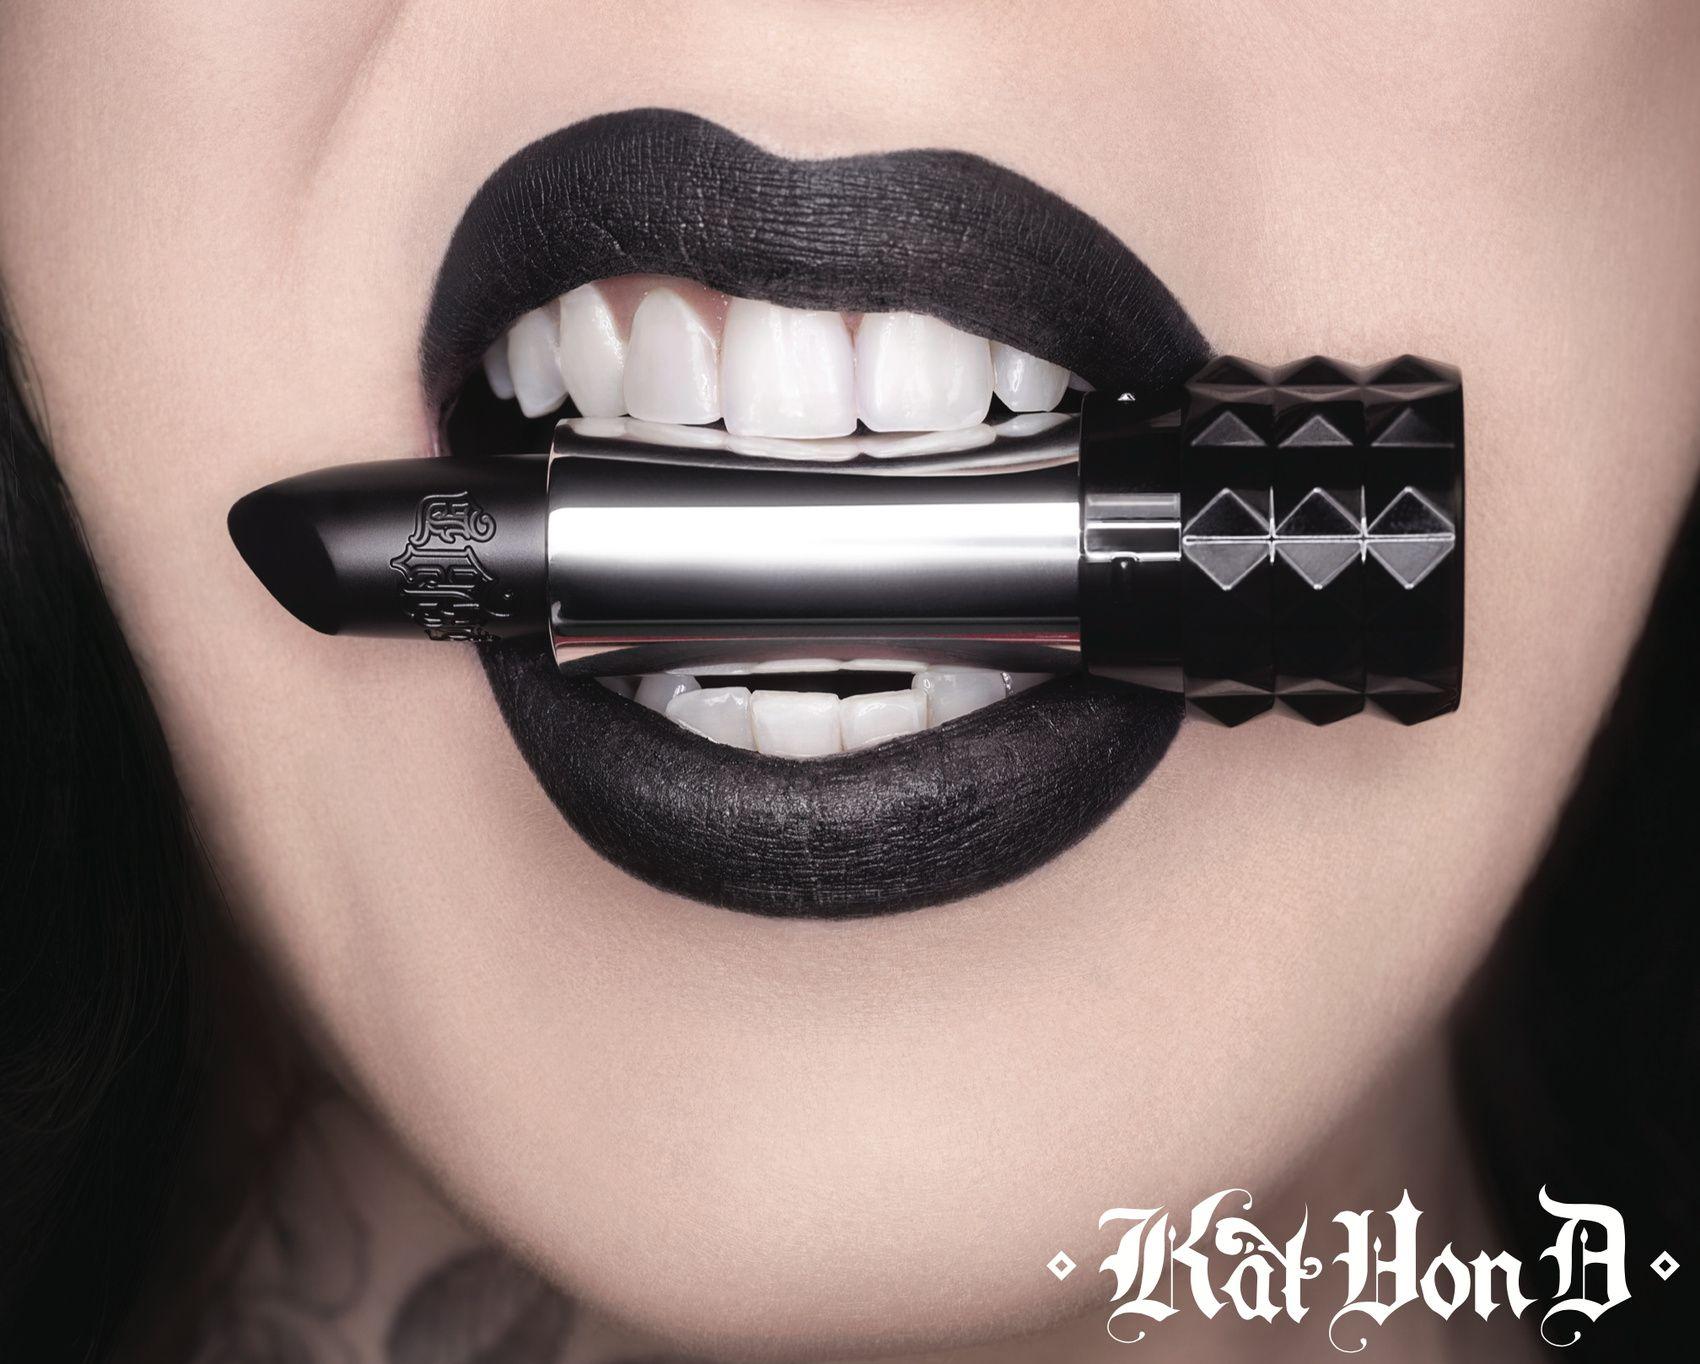 Lionel Deluy - Kat Von D - Makeup - Lipstick